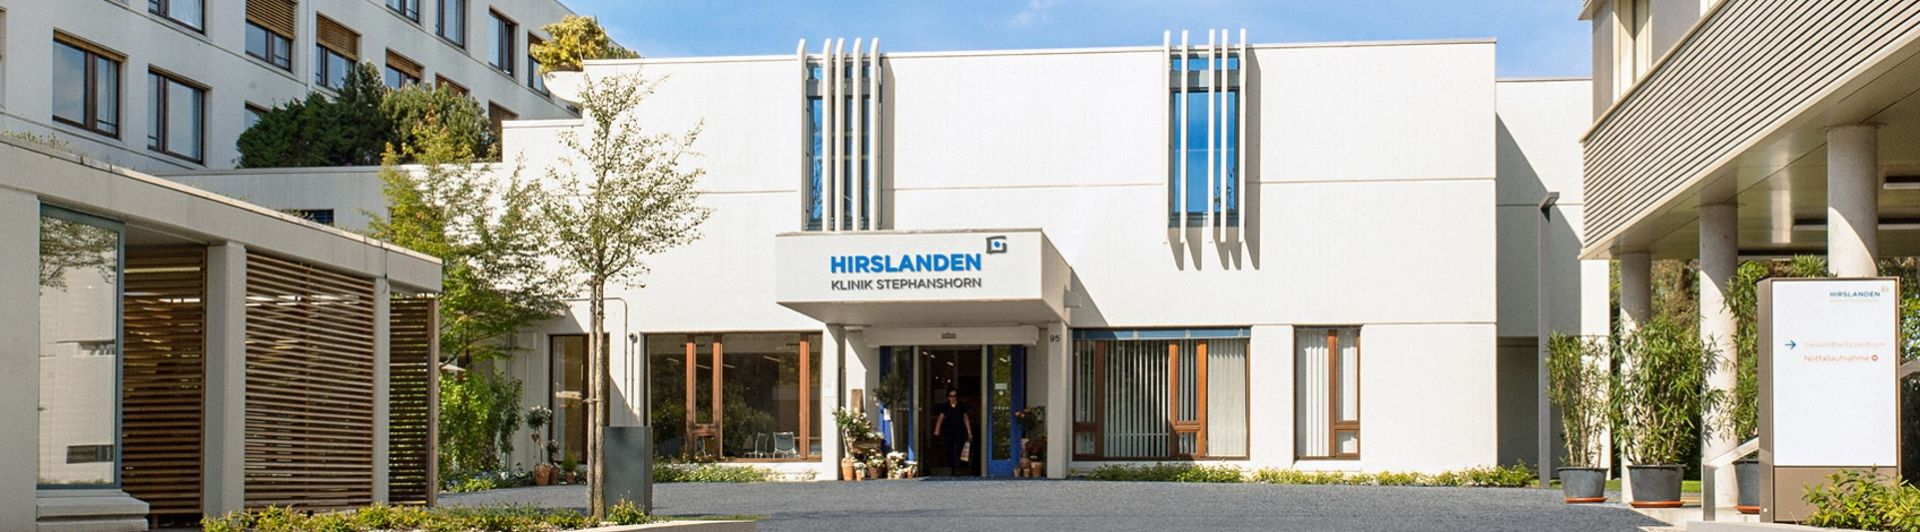 Hirslanden Klinik Stephanshorn, St.Gallen